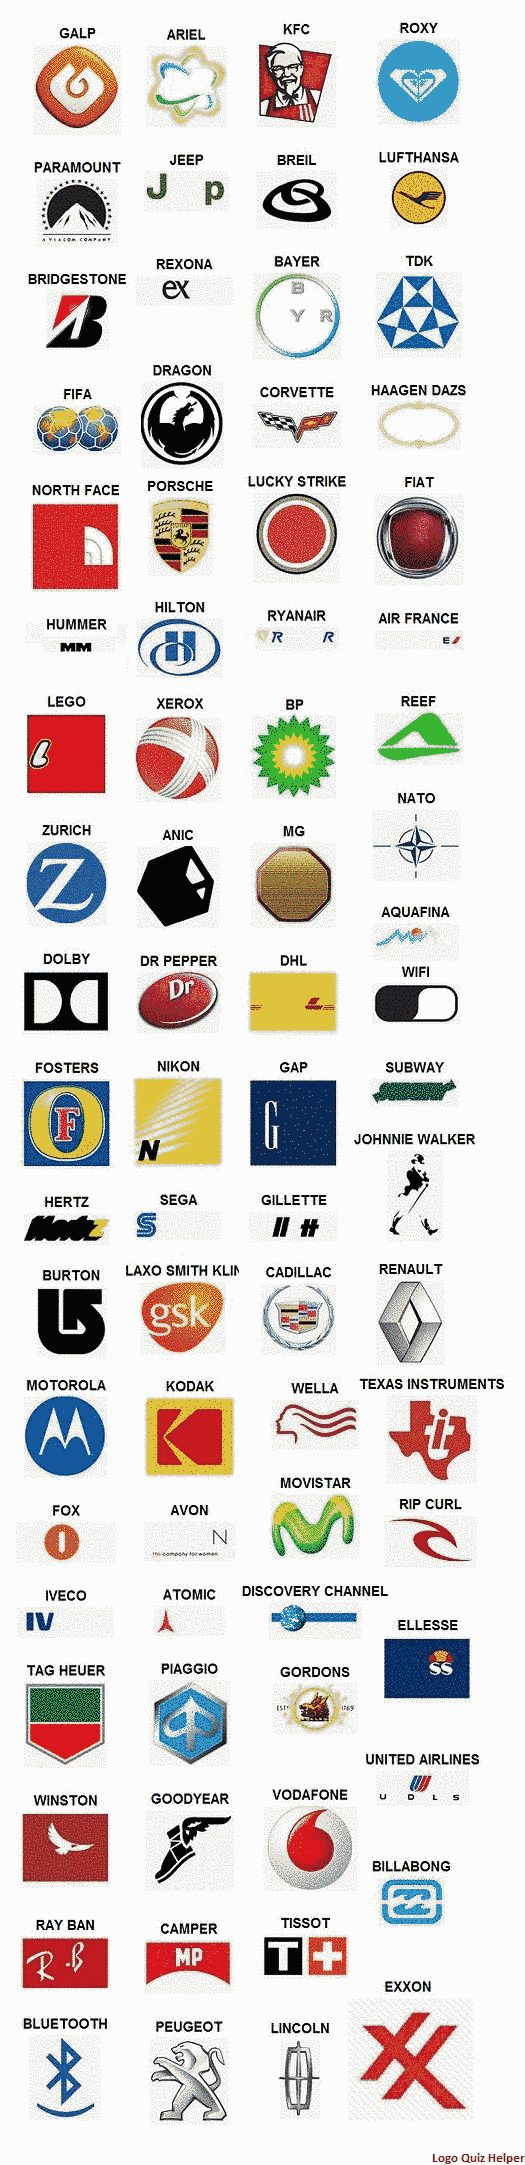 17 Best images about Logo quiz respuestas on Pinterest ...